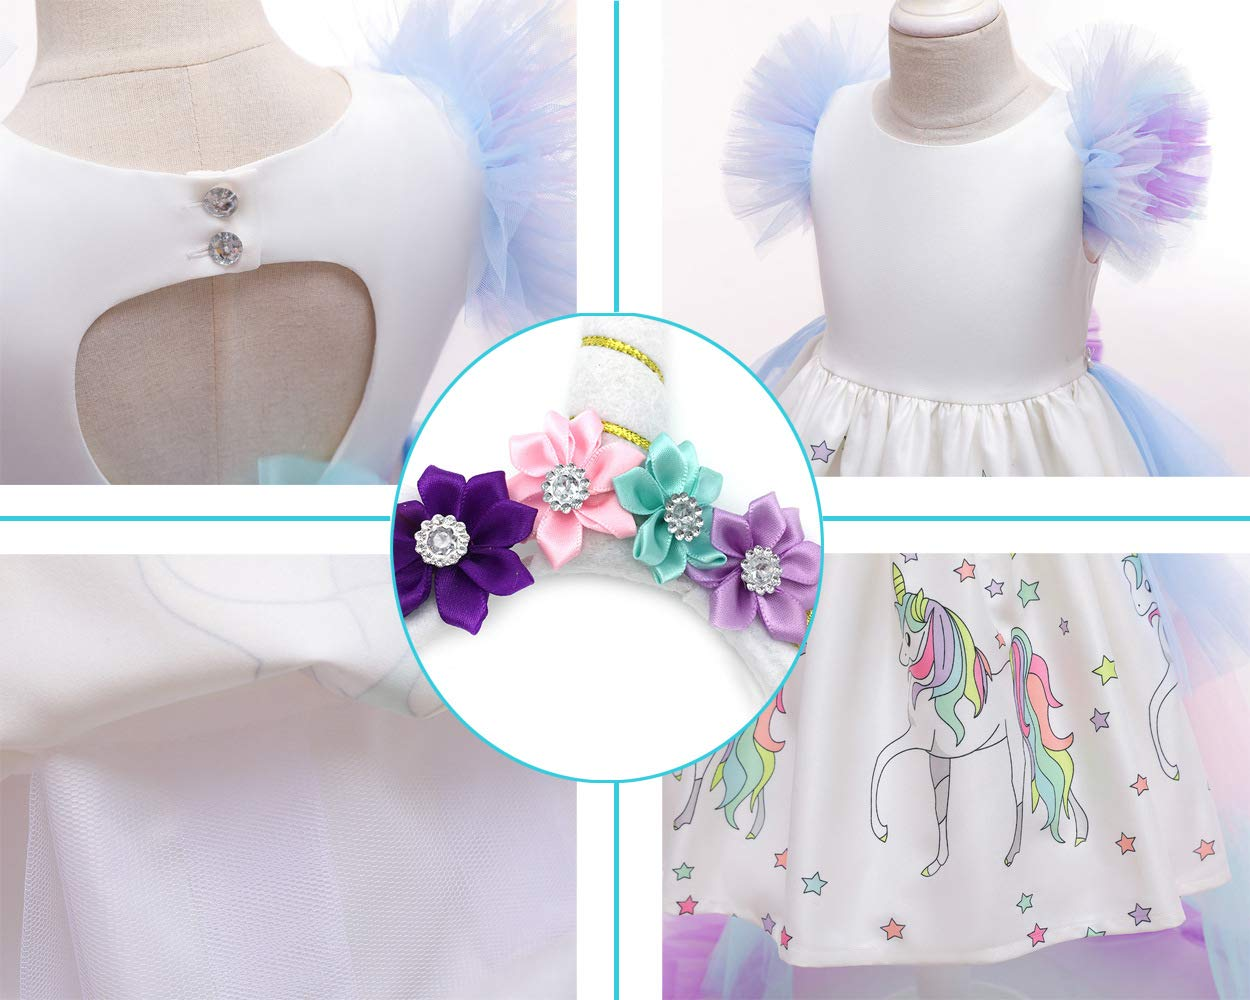 JiaDuo Girls Princess Party Dress, Rainbow Tutu Train & Headband 8